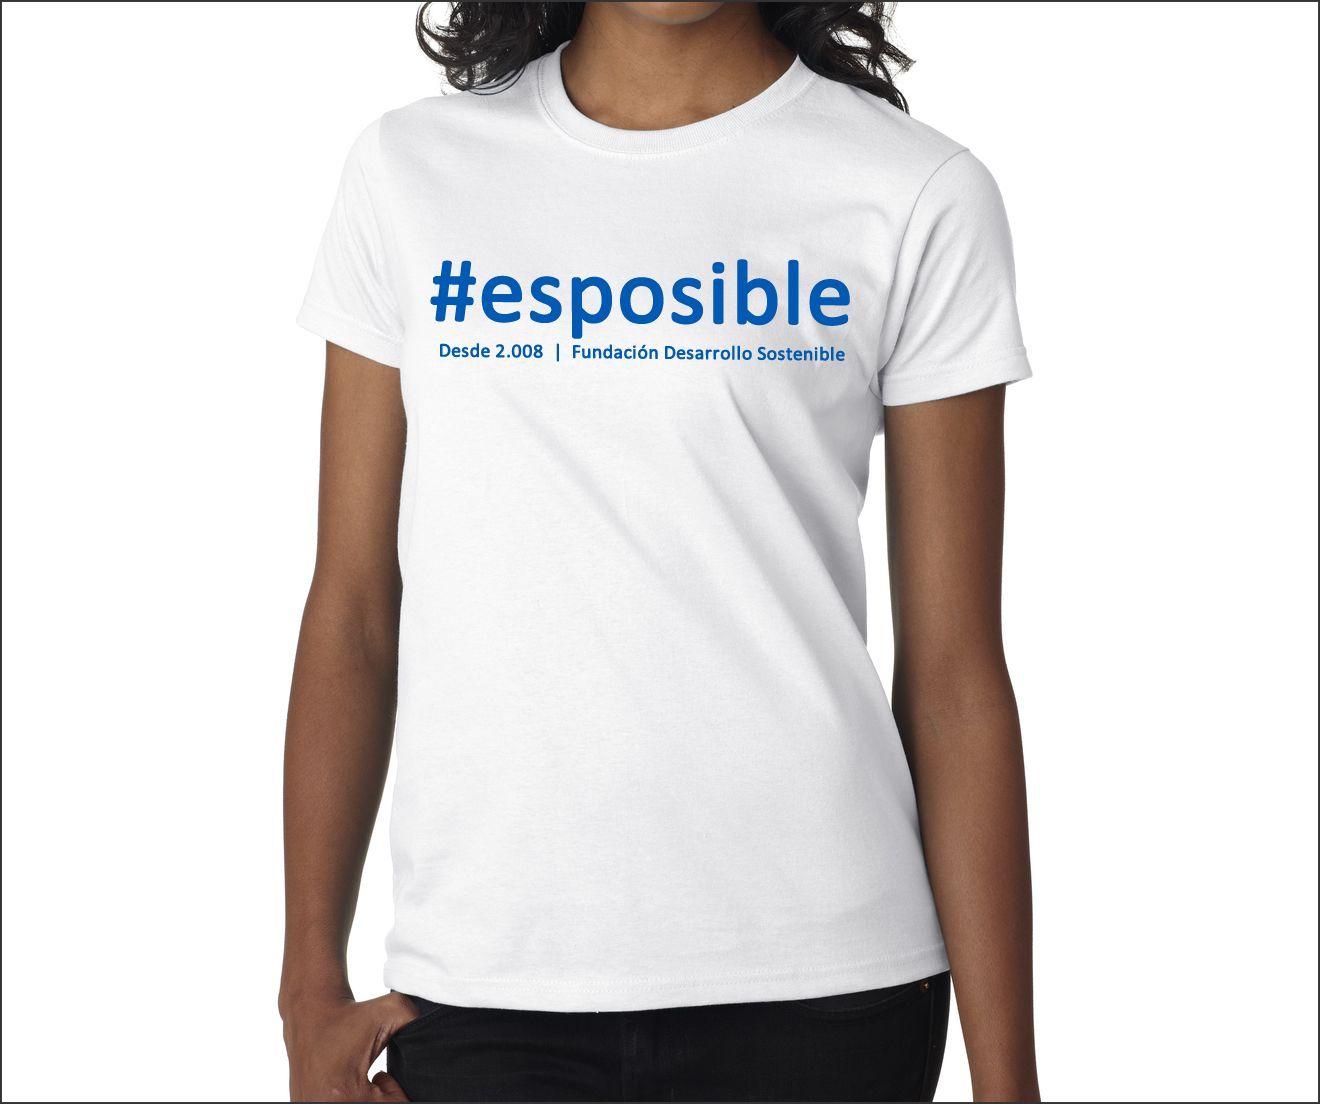 camisetaecomujer - Camiseta Ecológica